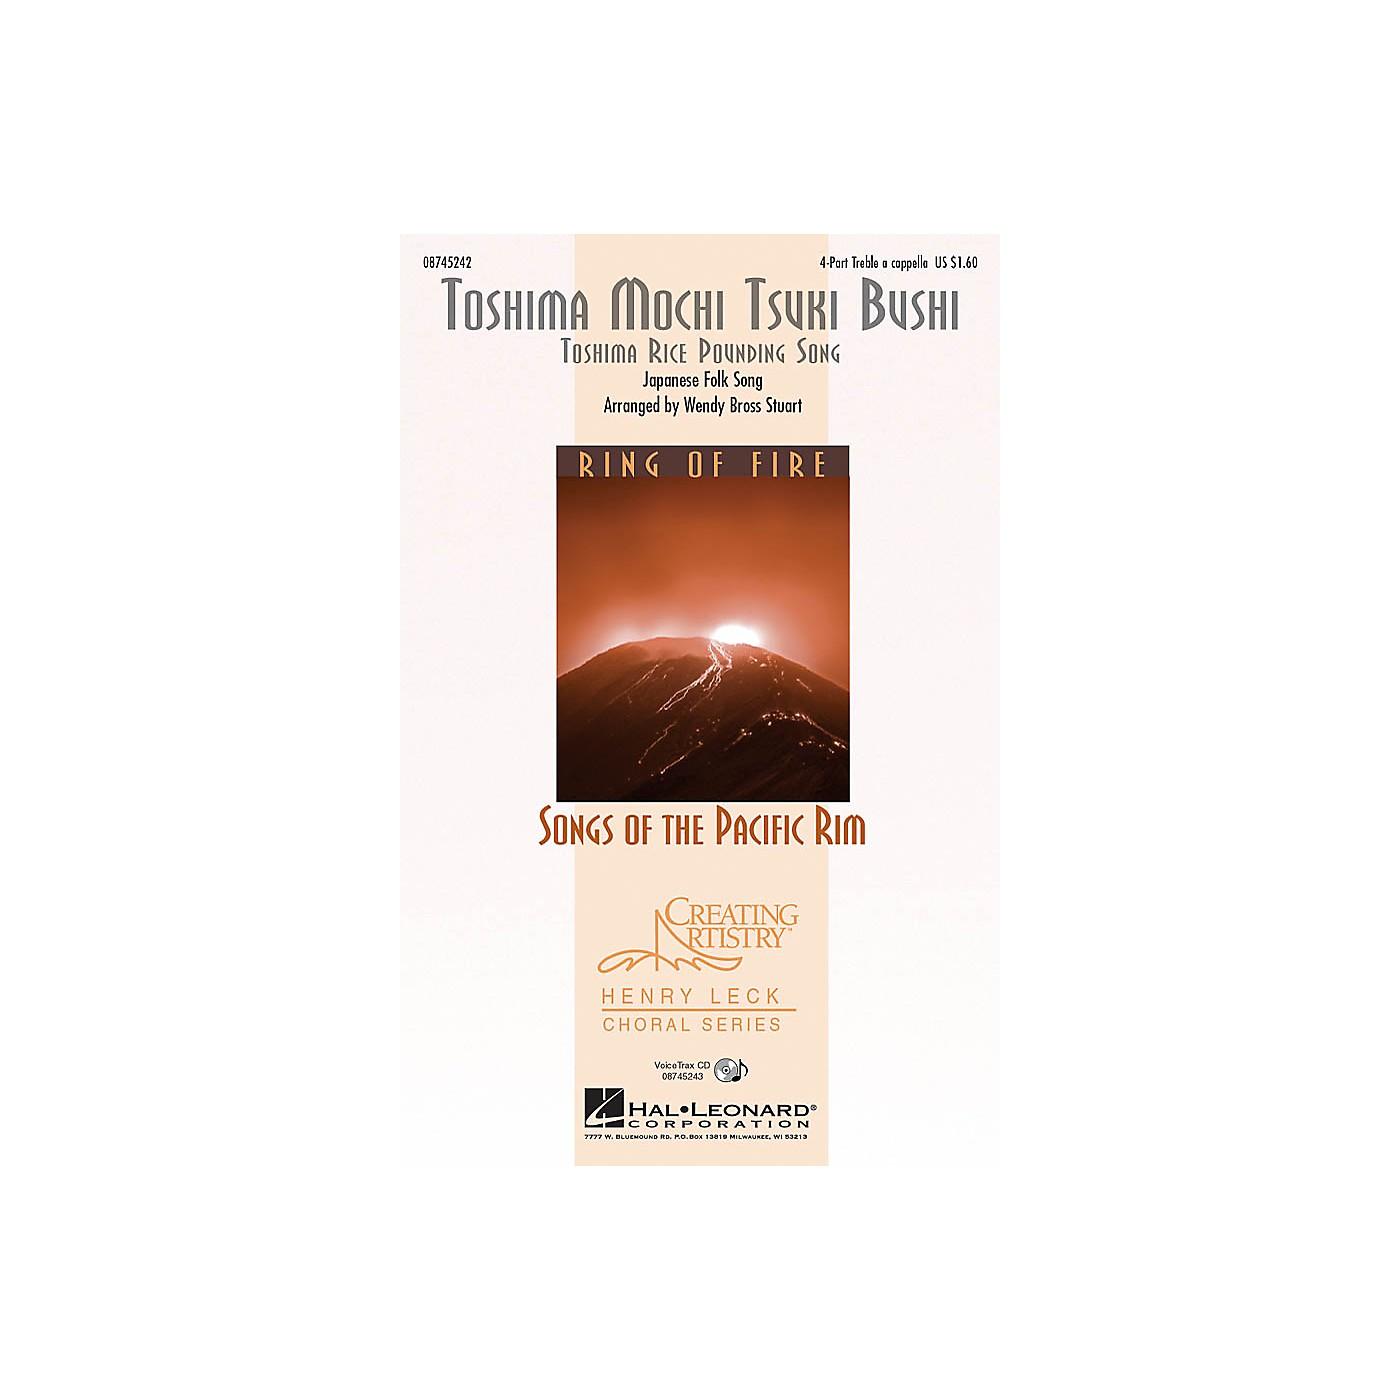 Hal Leonard Toshima Mochi Tsuki Bushi (Toshima Rice Pounding Song) 4 Part Treble A Cappella arranged by Wendy Bross Stuart thumbnail